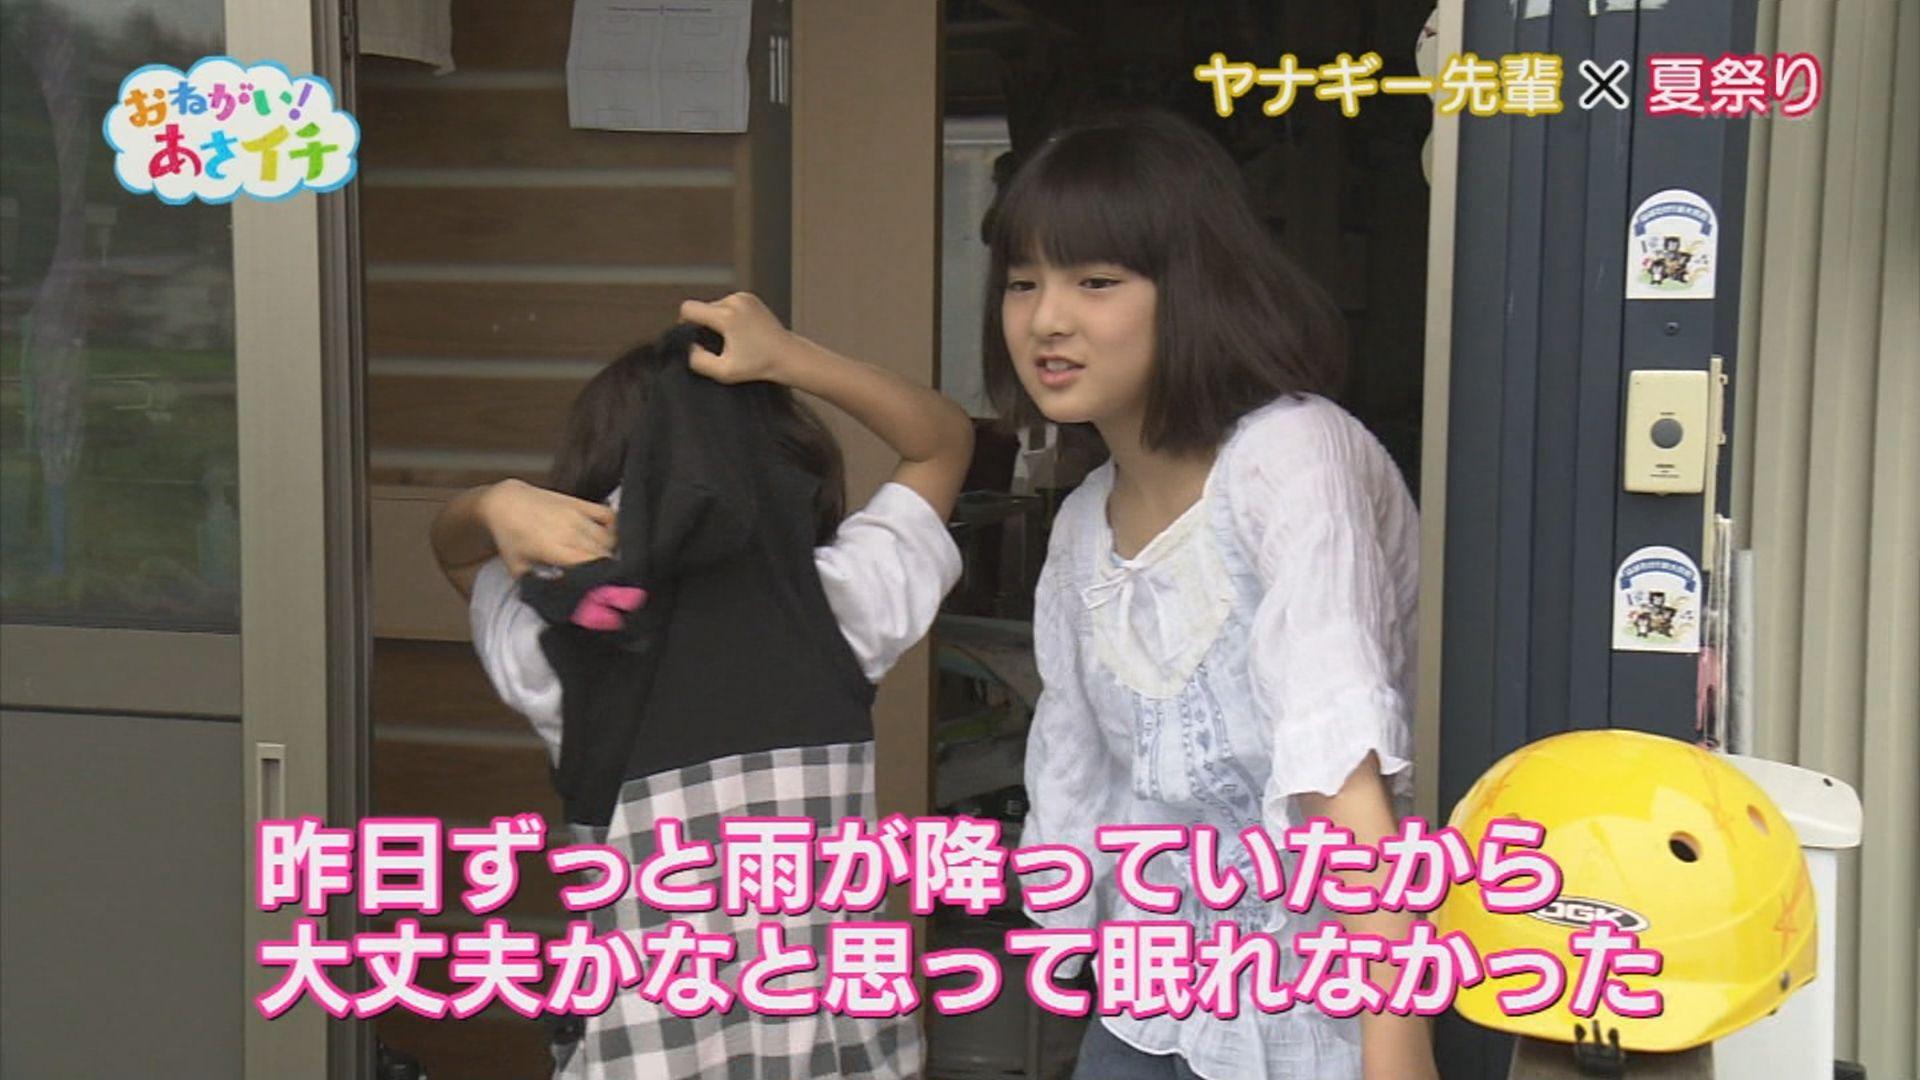 NHK「おねがい!あさイチ 2016夏」に出演した可愛すぎる女子小学生